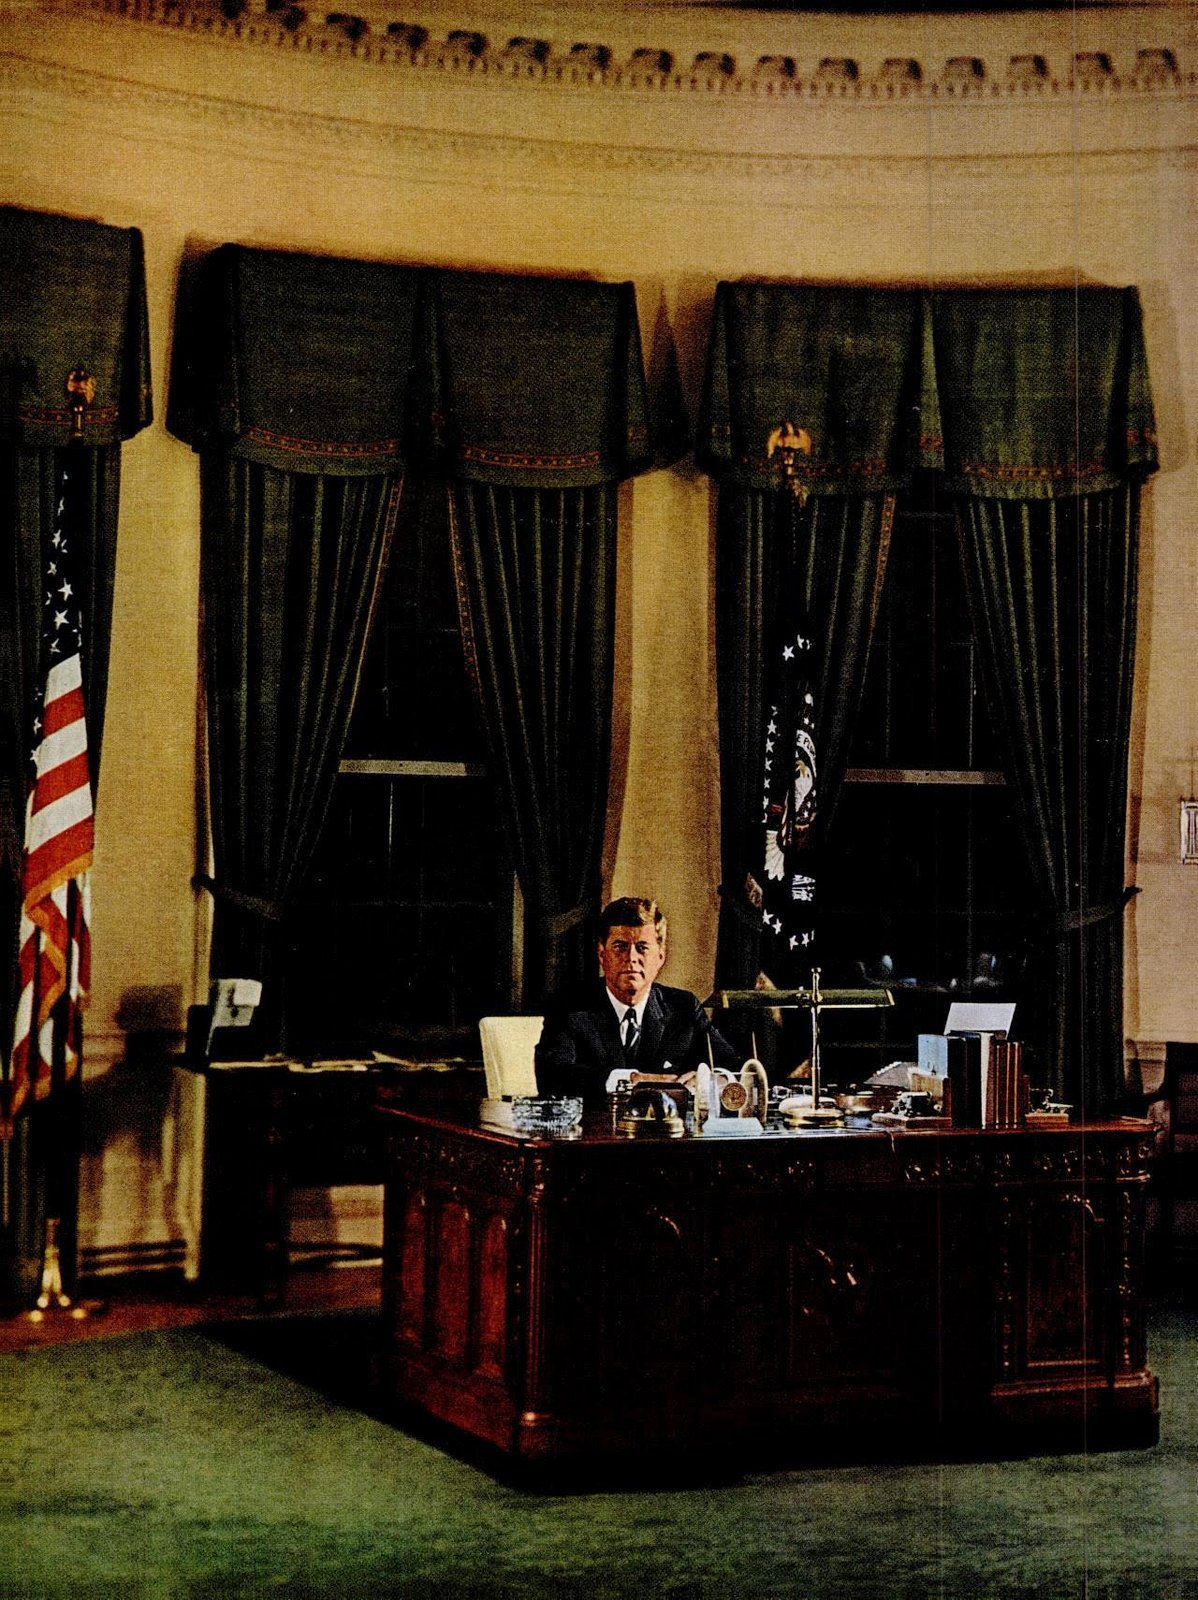 JFK in the Oval Office